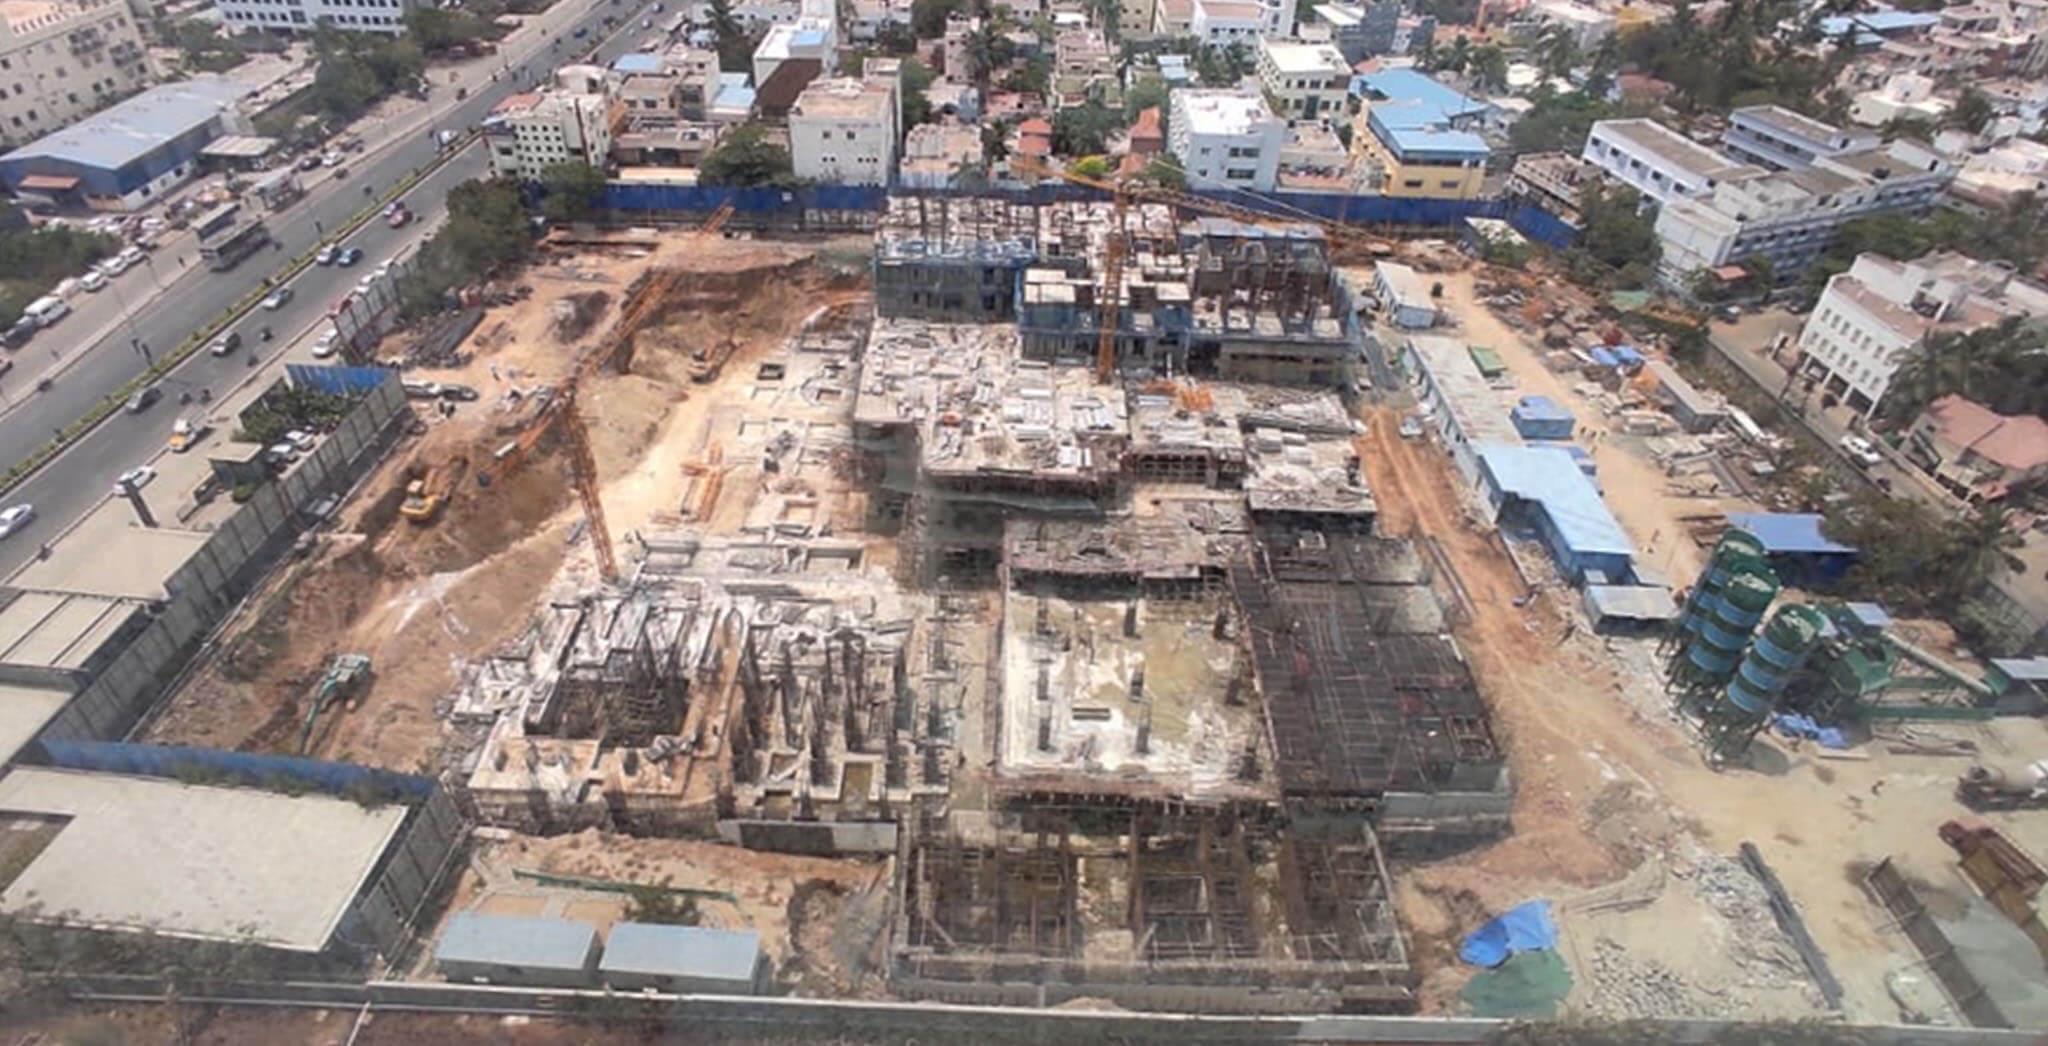 Mar 2021 - Overall progress